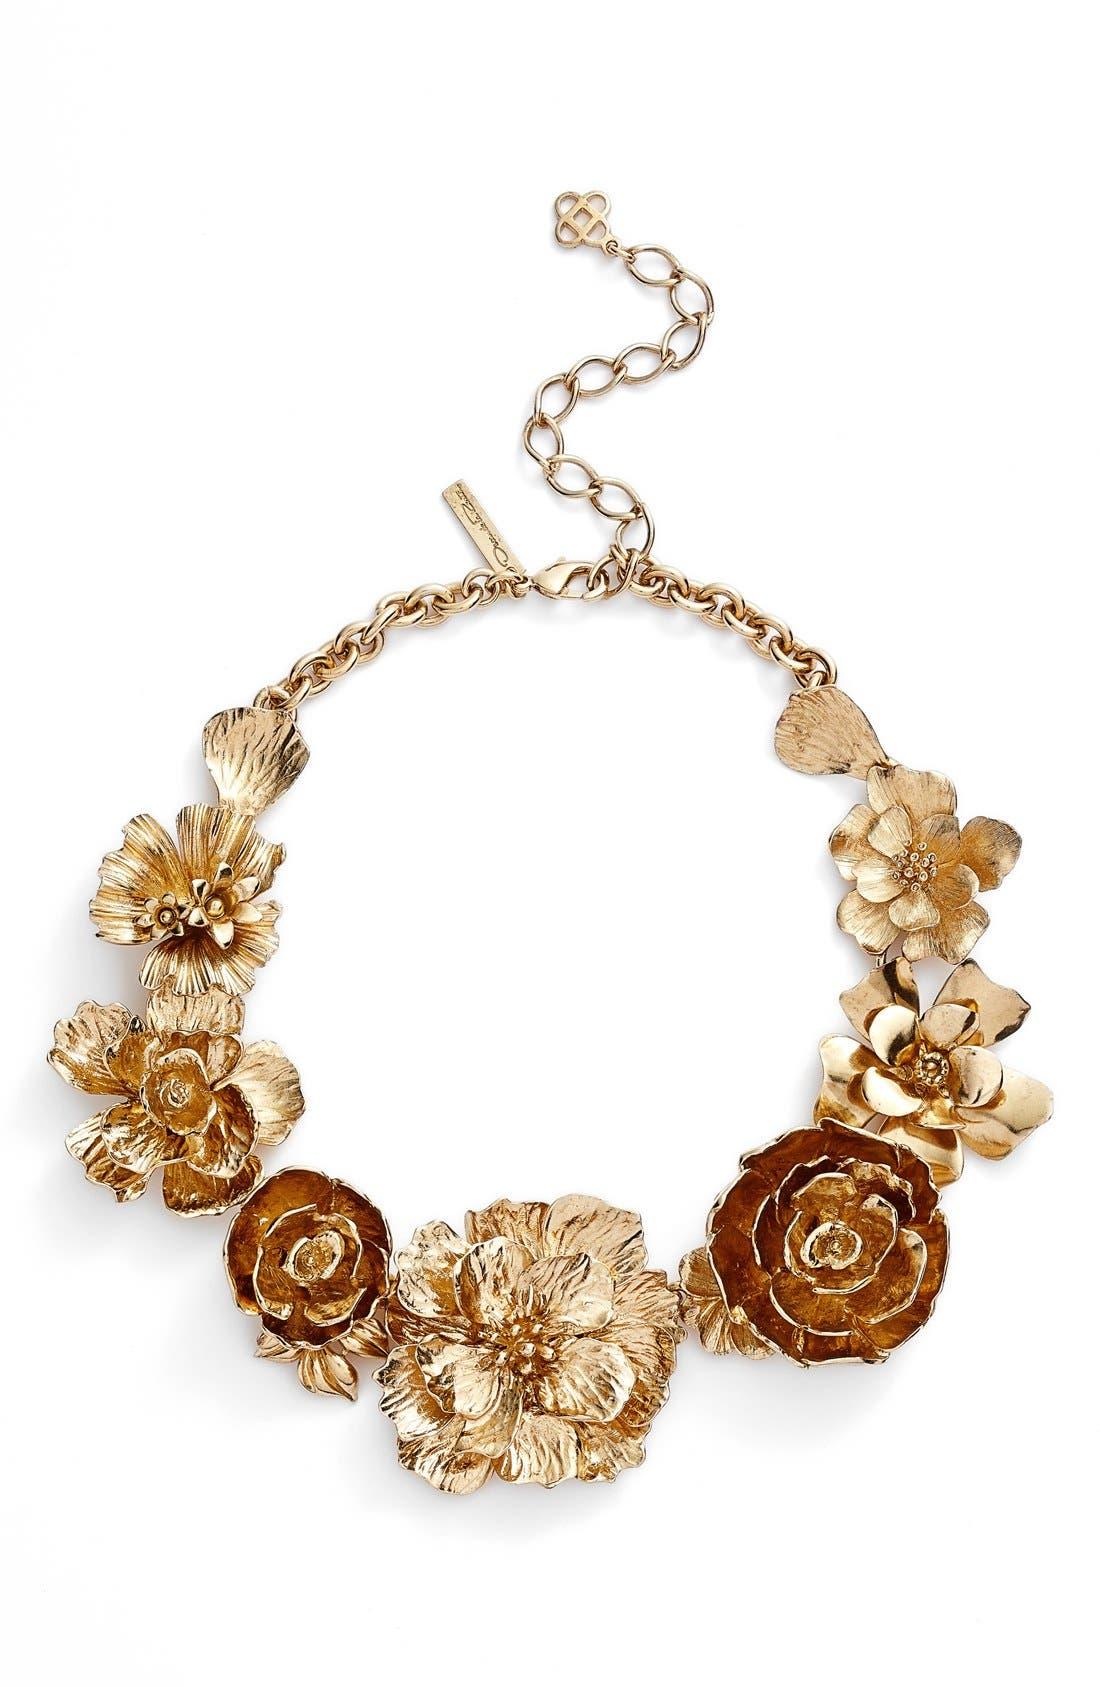 Main Image - Oscar de la Renta 'Bold Flower' Necklace